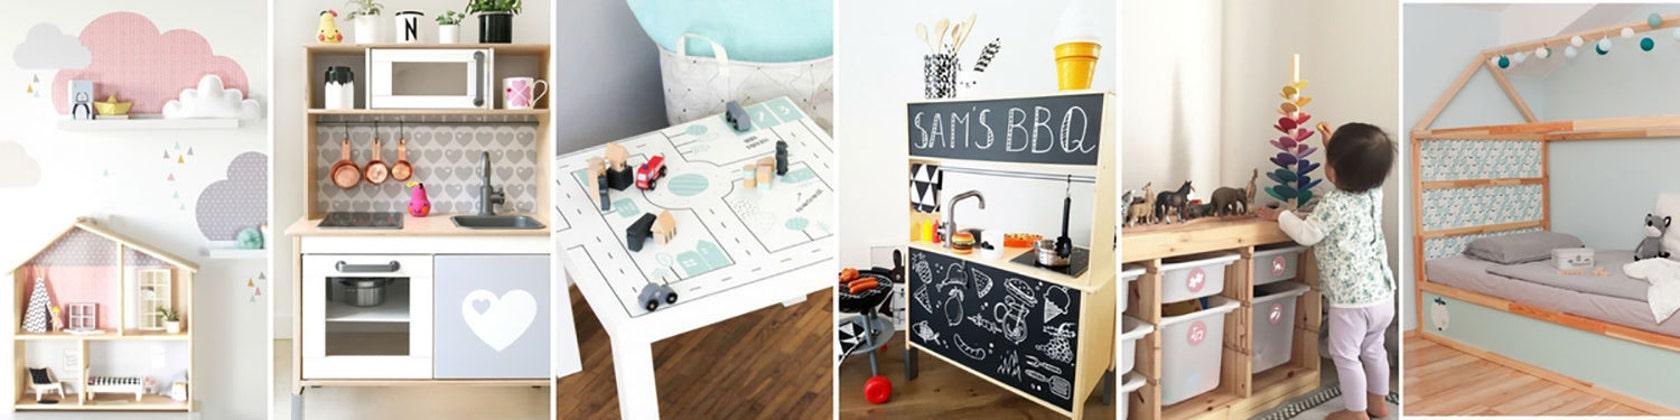 Ikea Wall Decor And Furniture Stickers De Limmaland En Etsy